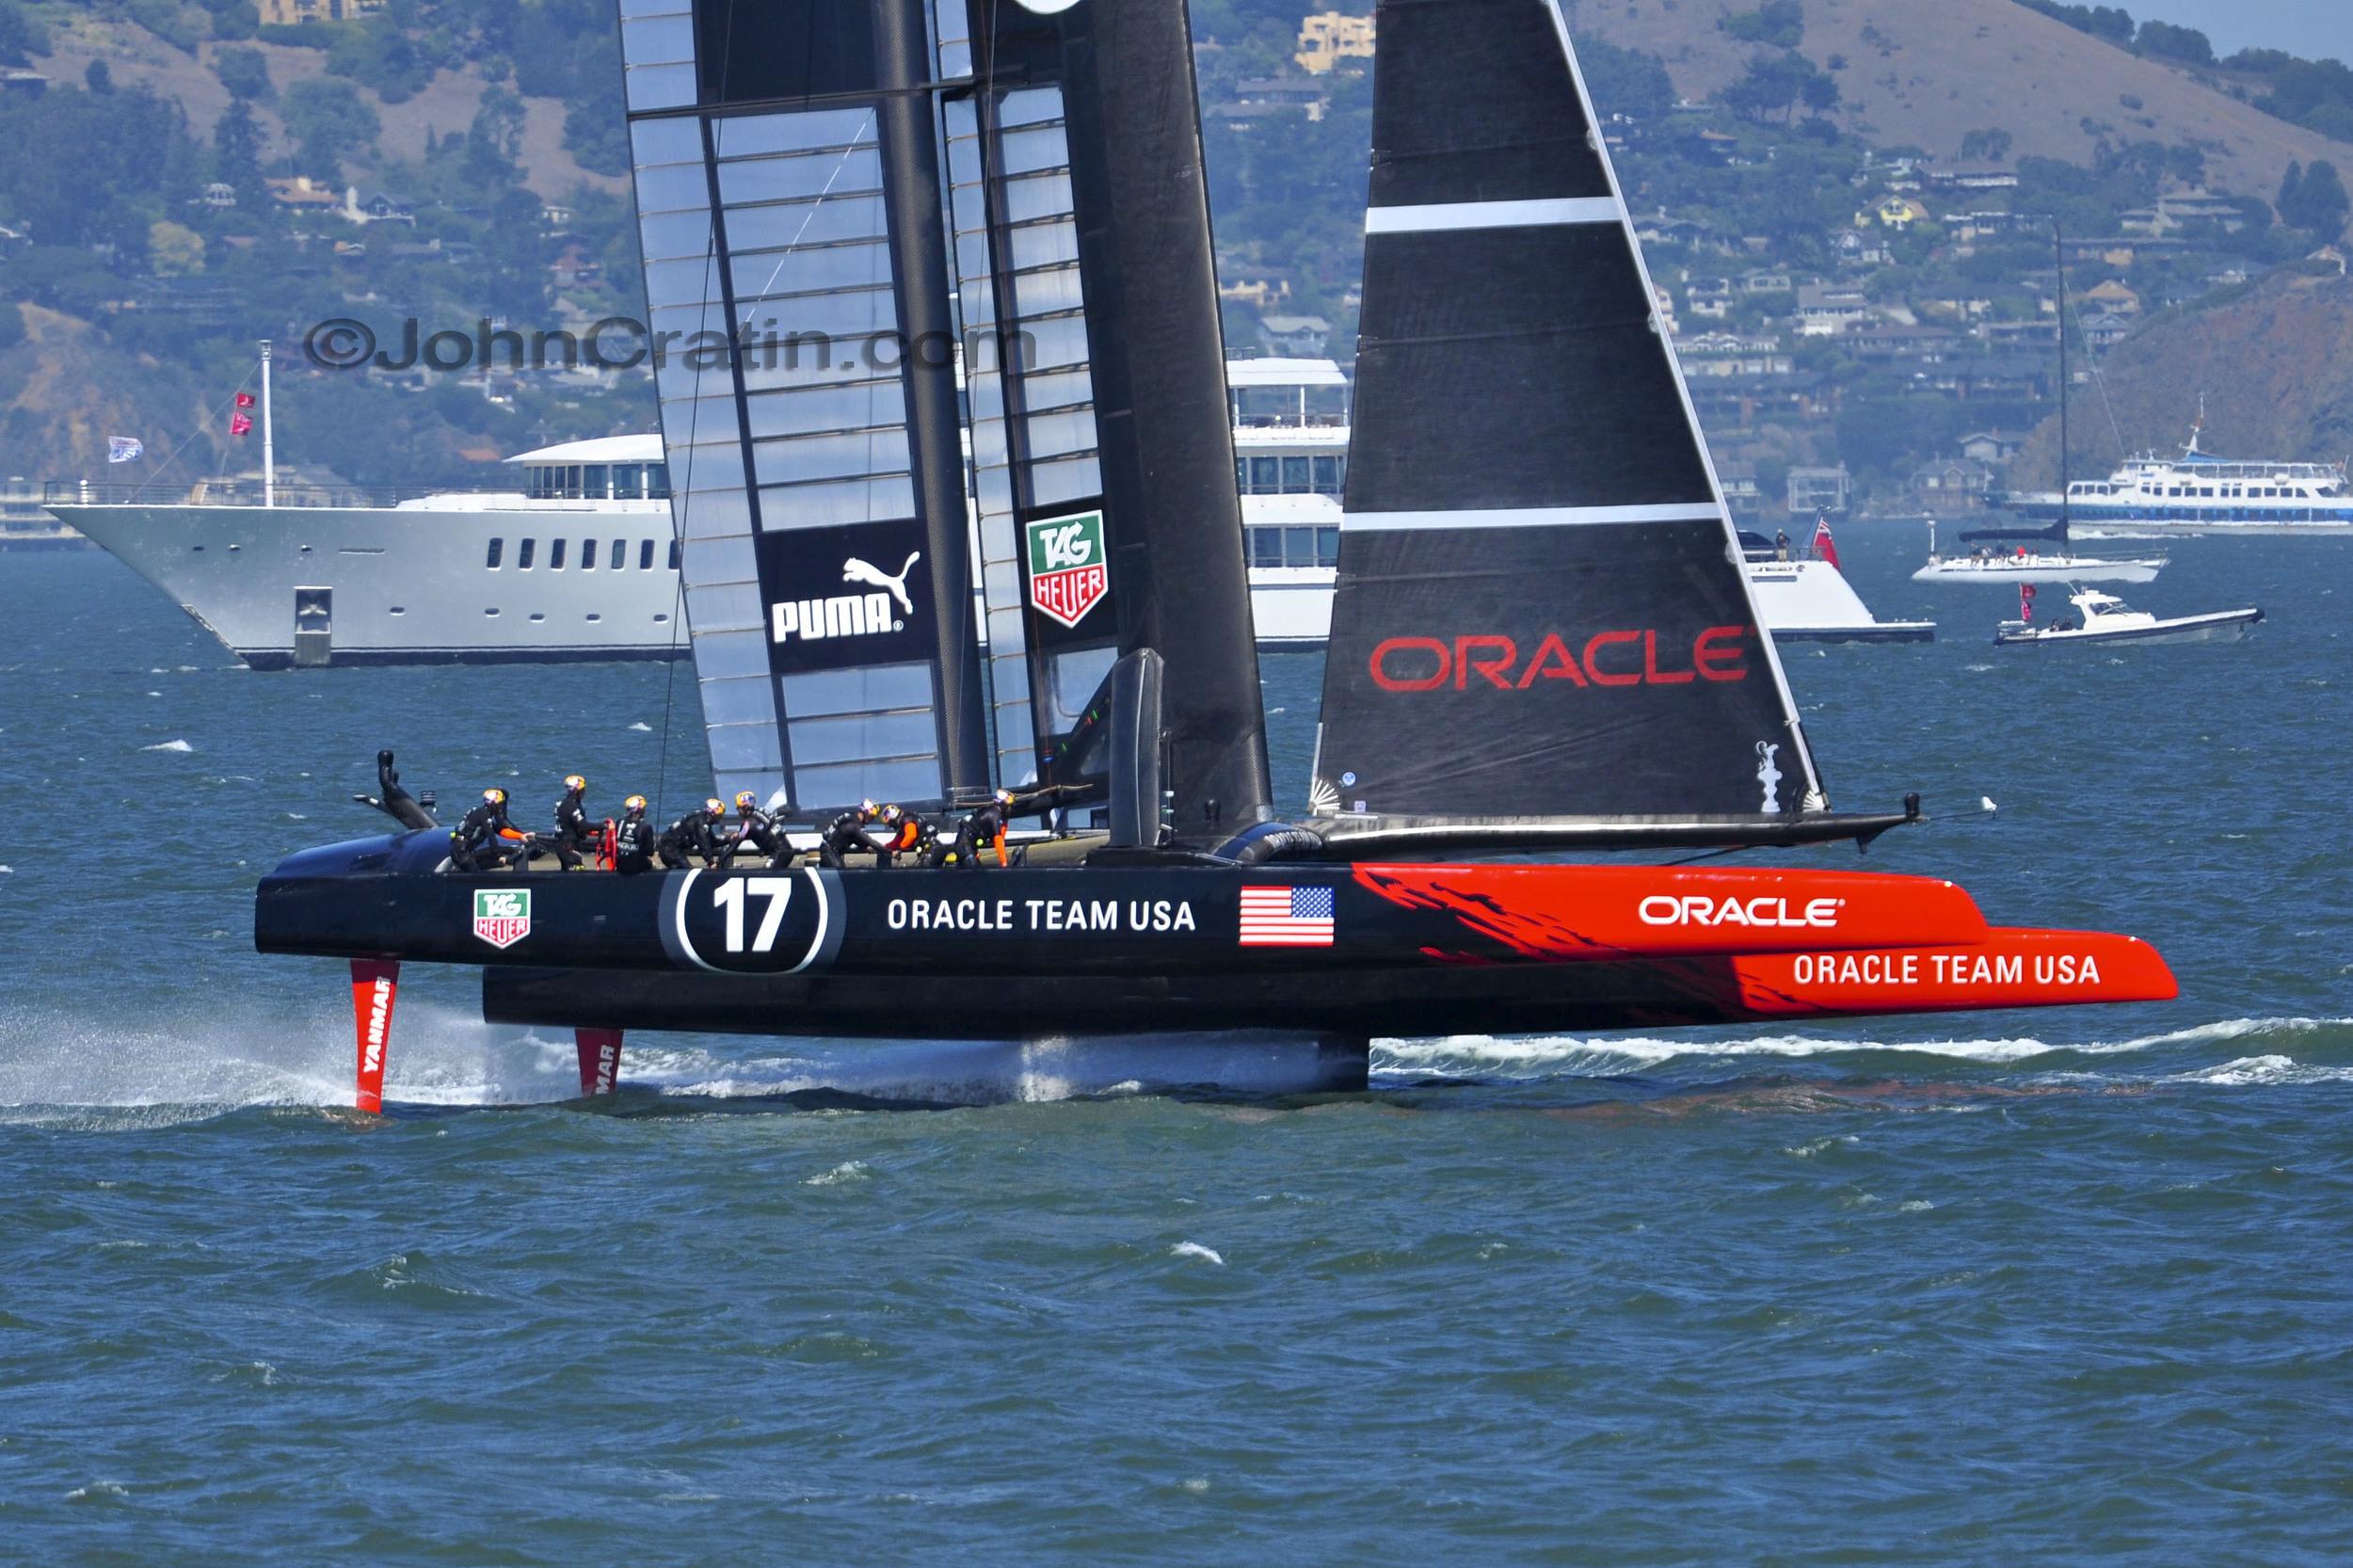 Oracle 5 CR.jpg